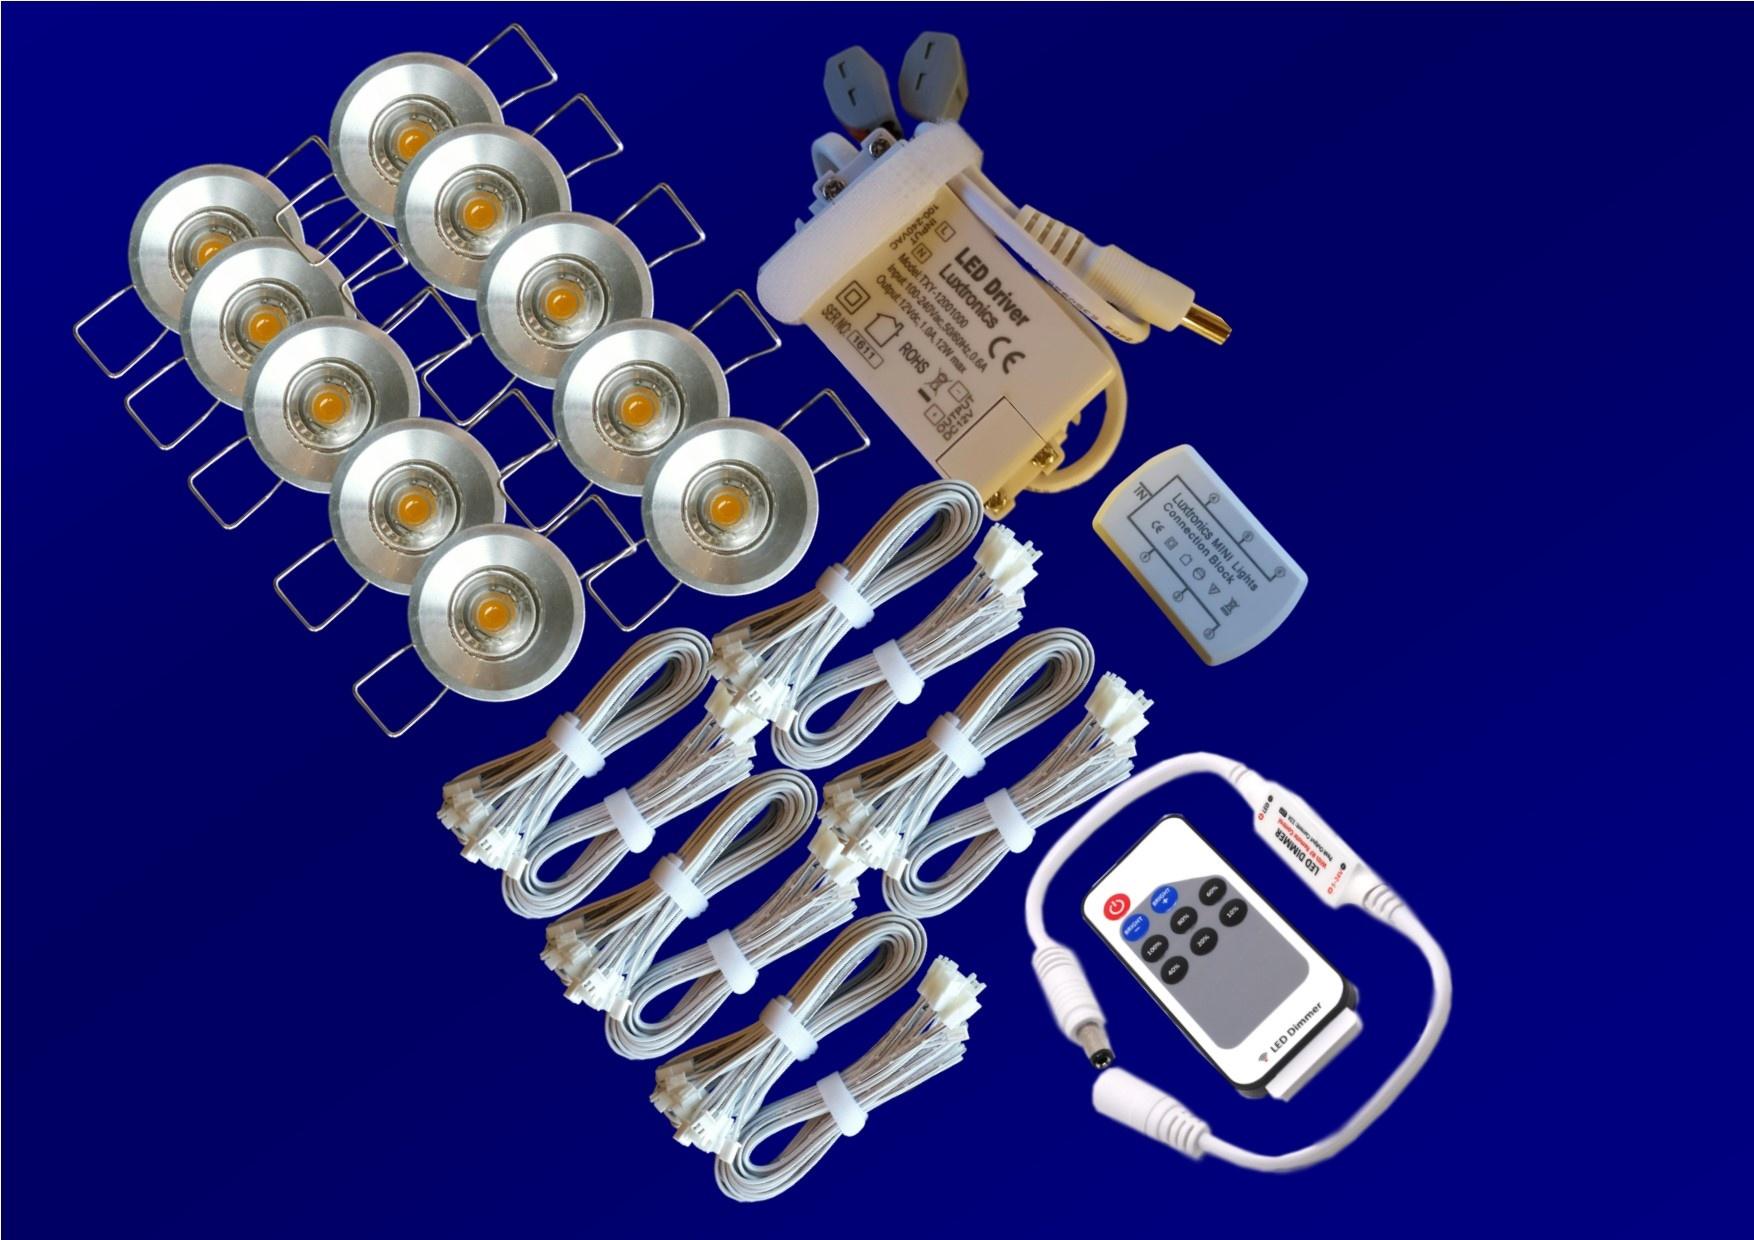 LED set 8 x 1w spots  incl. dimmer